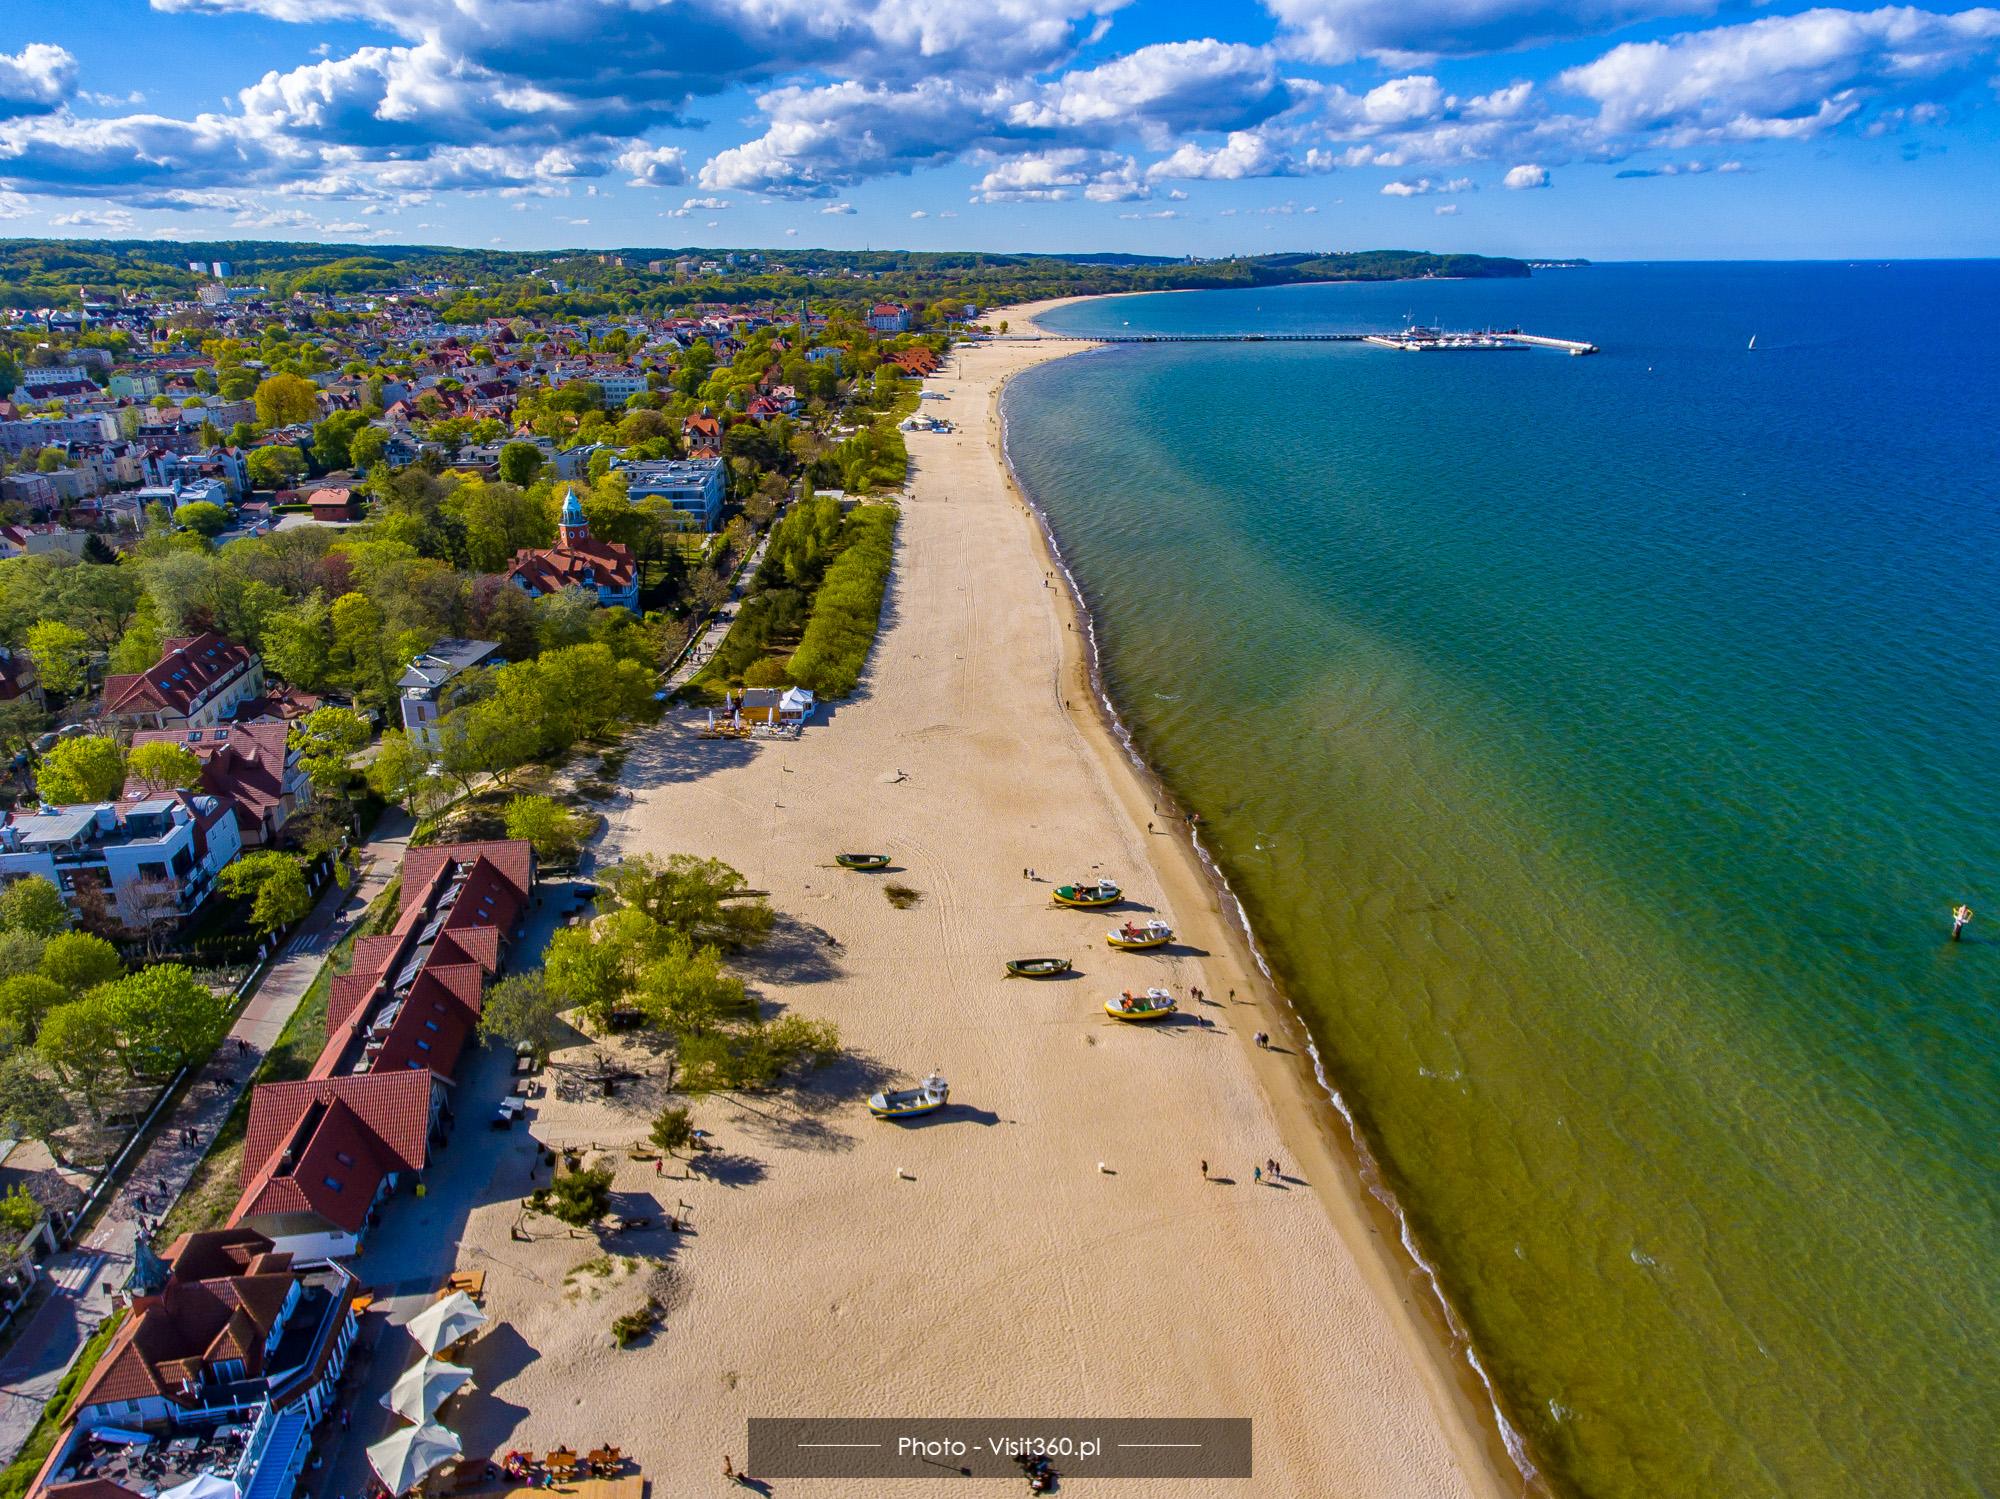 Visit360_pl_Sopot_zdjecia_z_drona_20190505_0451